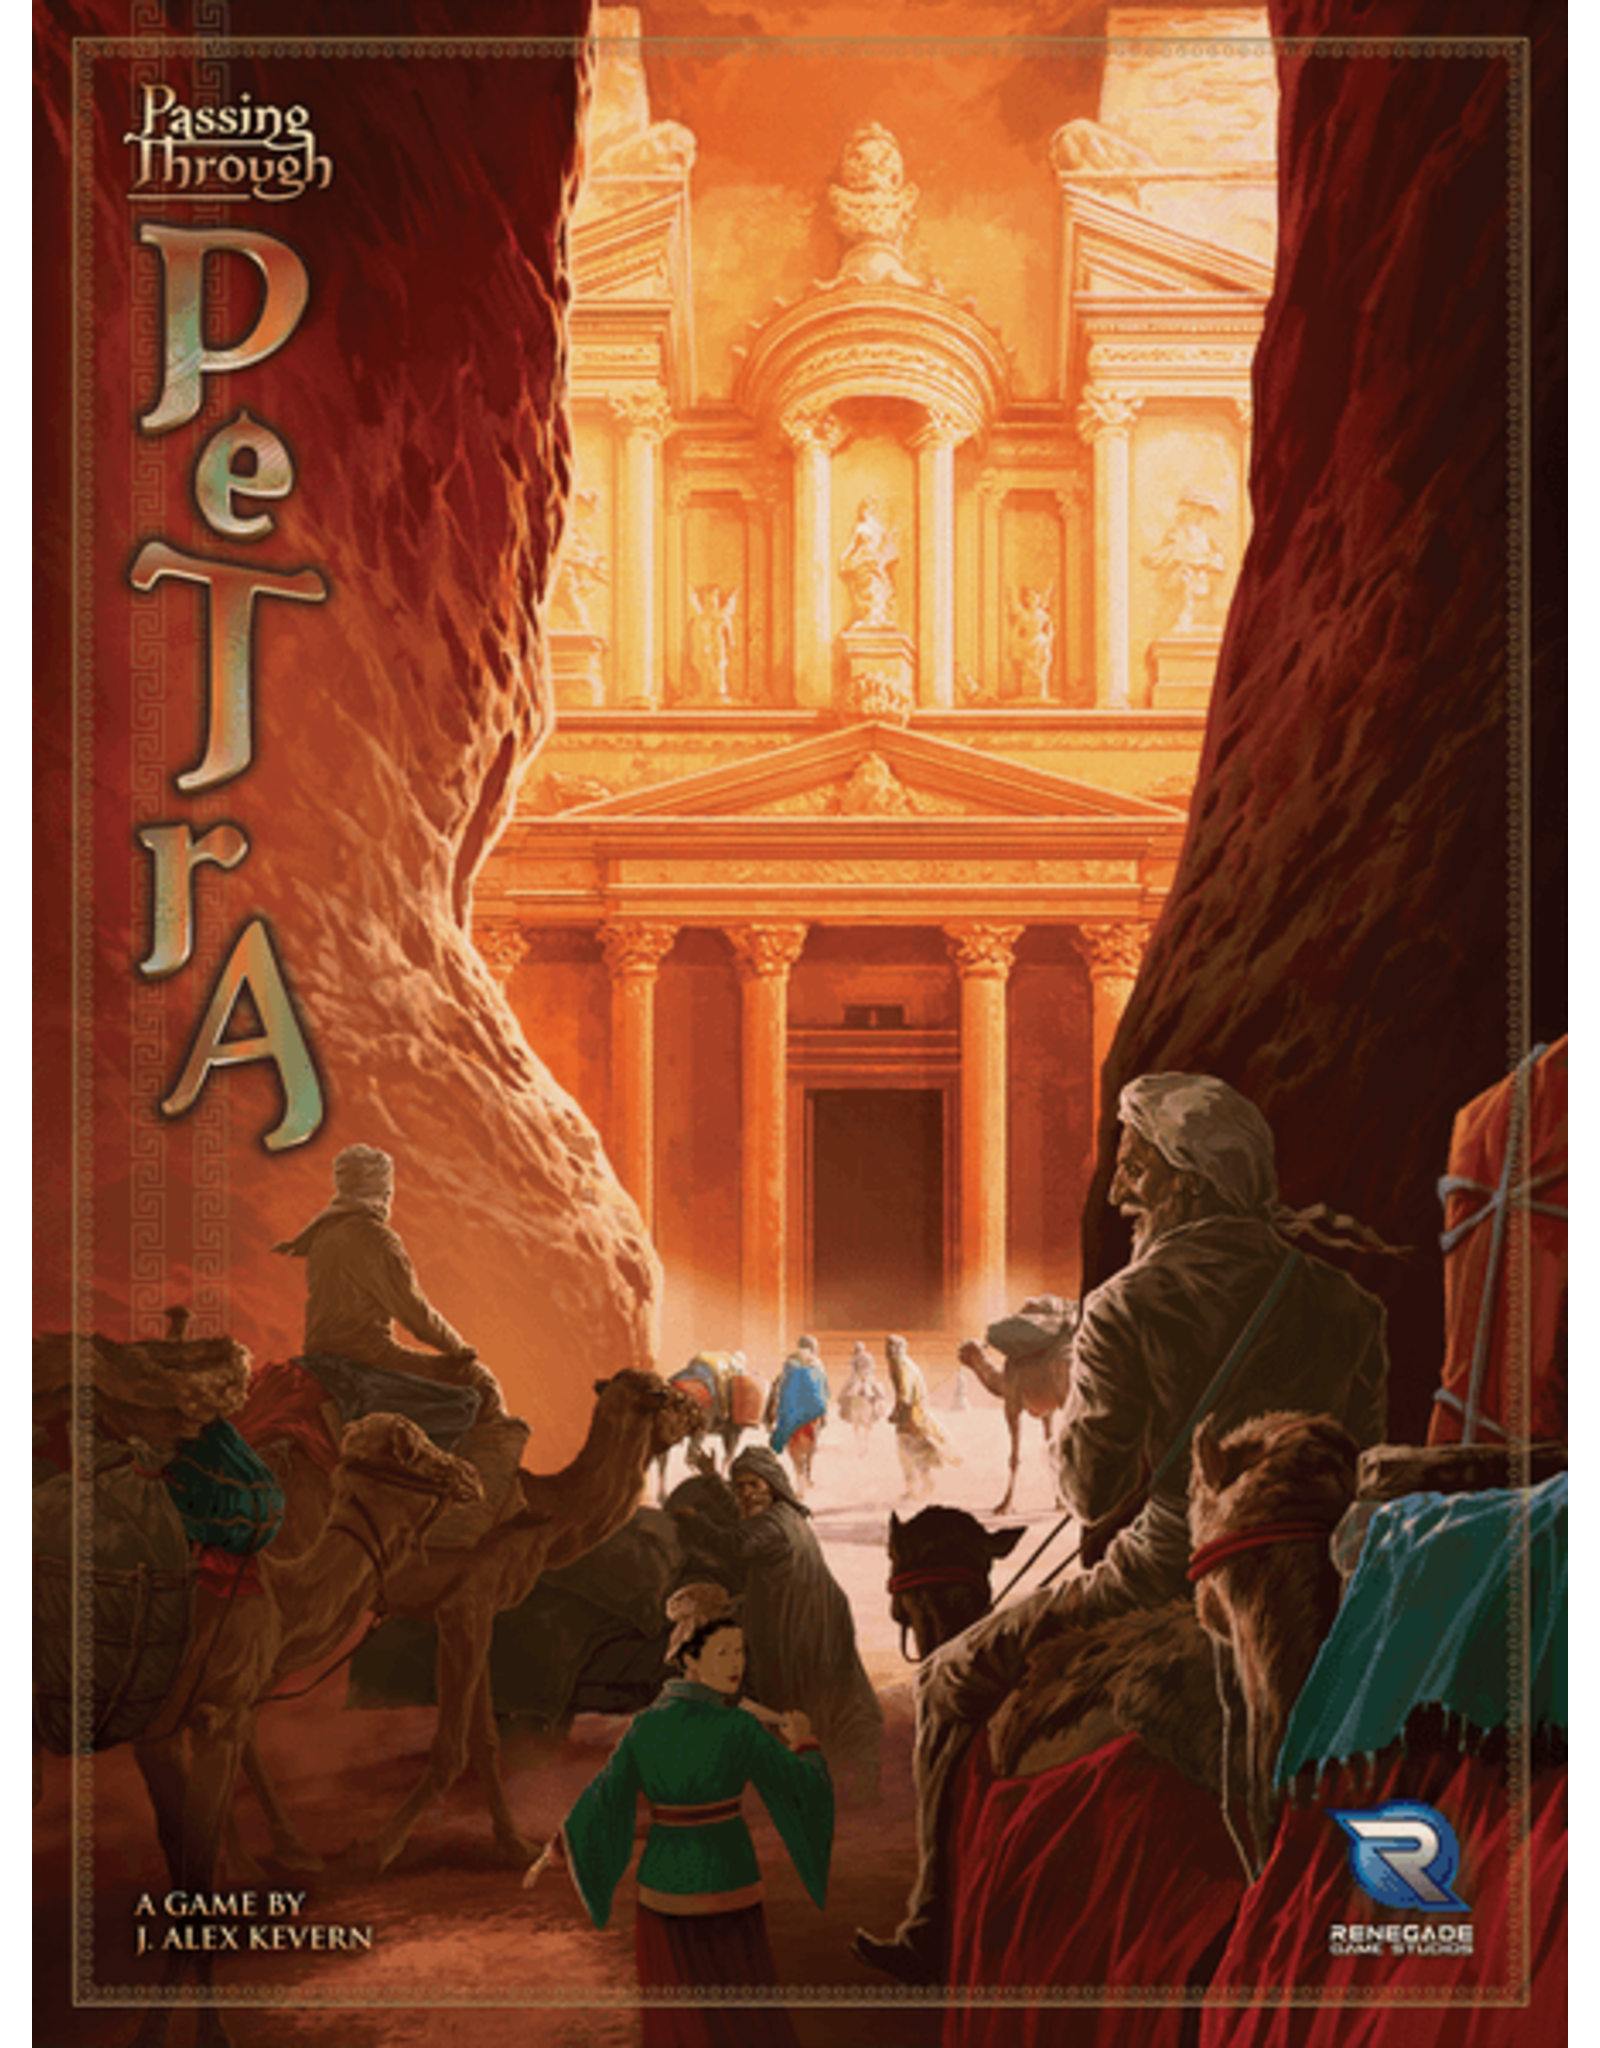 Renegade Game Studios Passing Through Petra